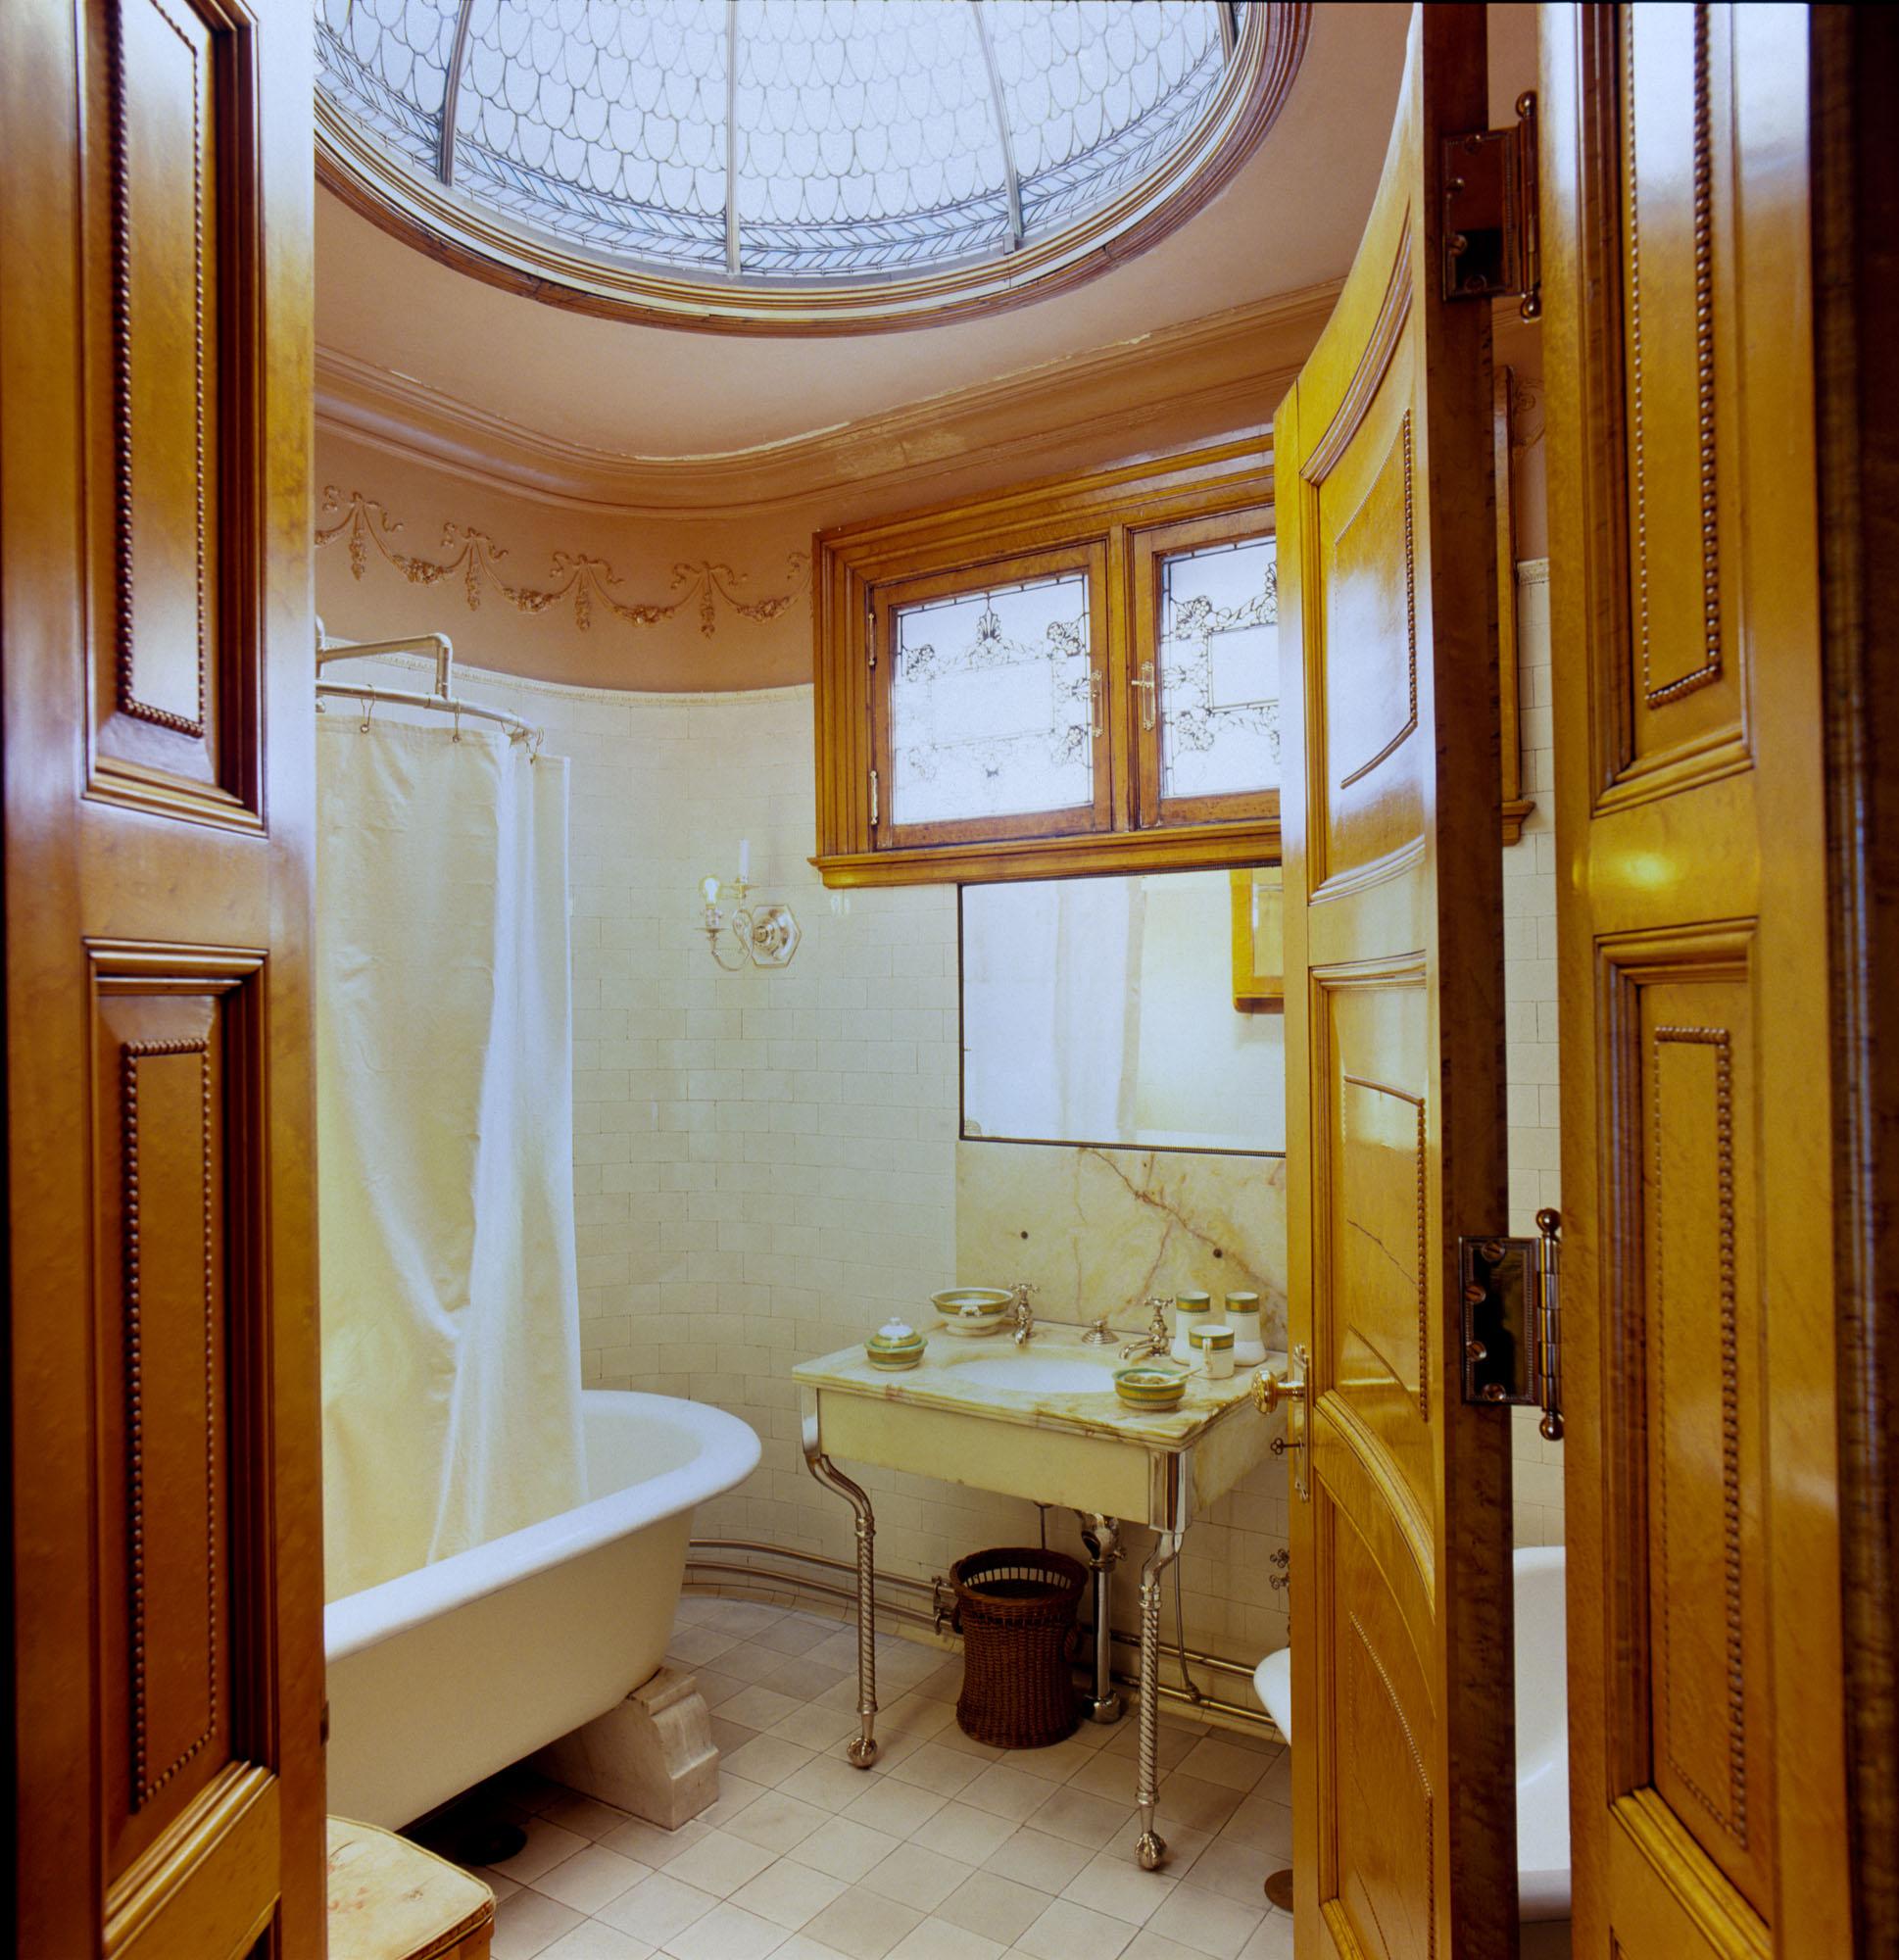 Victorian-era bathroom